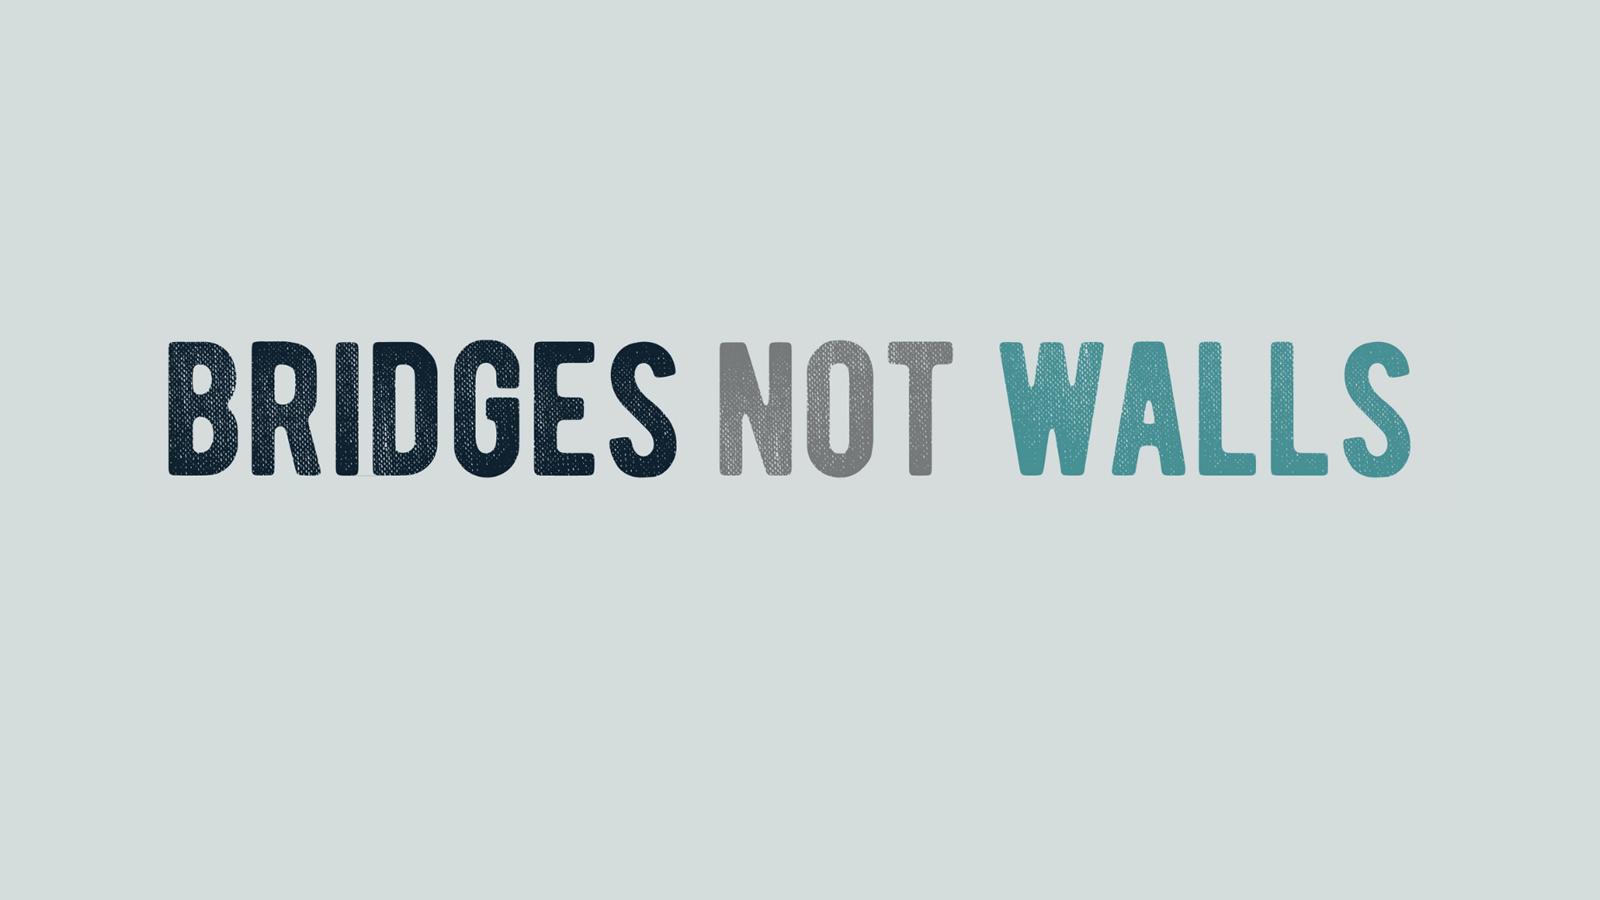 bridges-not-walls-trump-inauguration